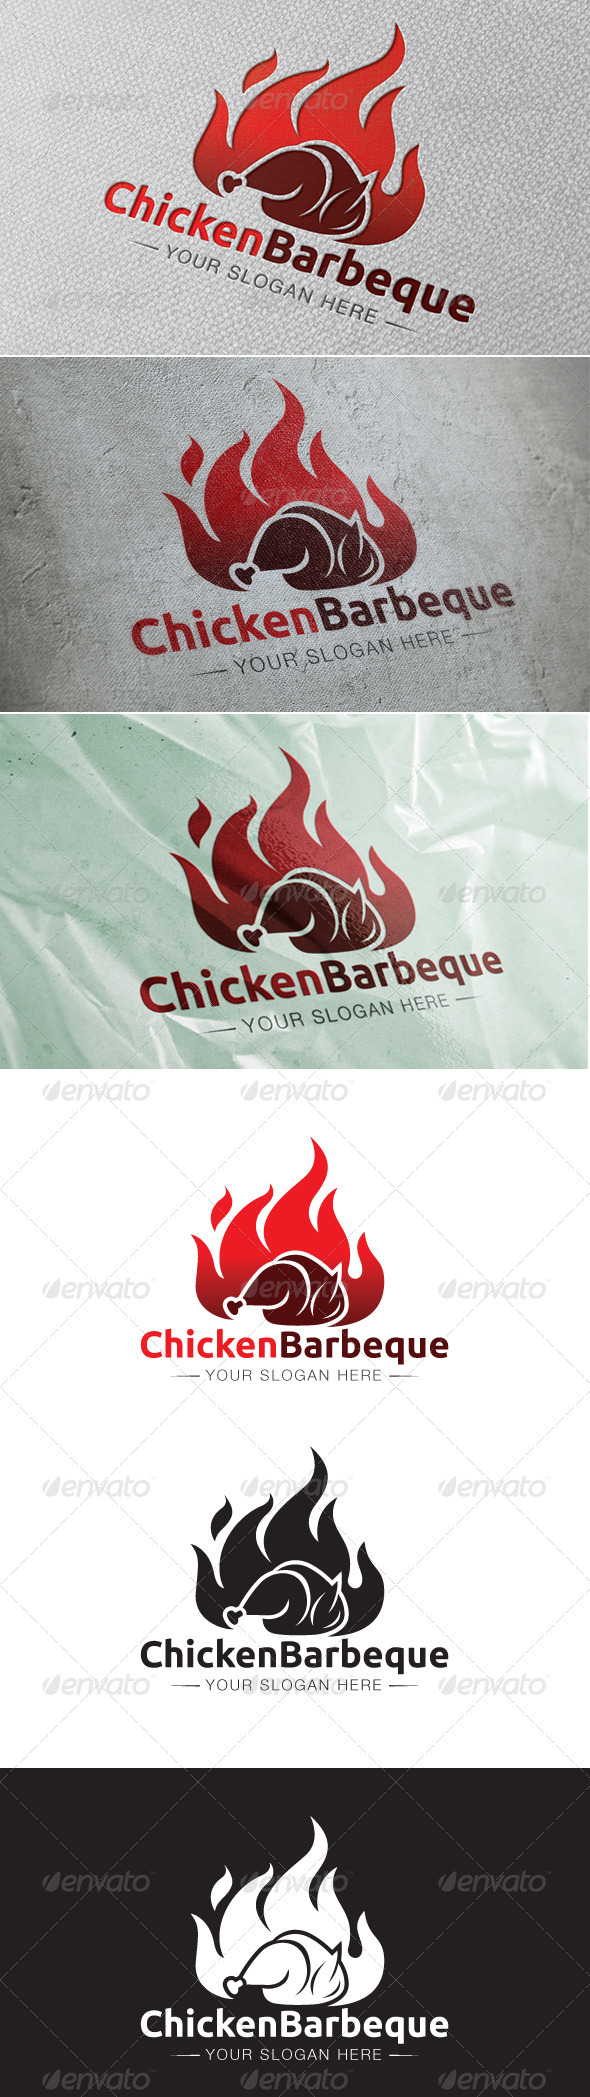 Chicken Barbeque Logo Template - Animals Logo Templates